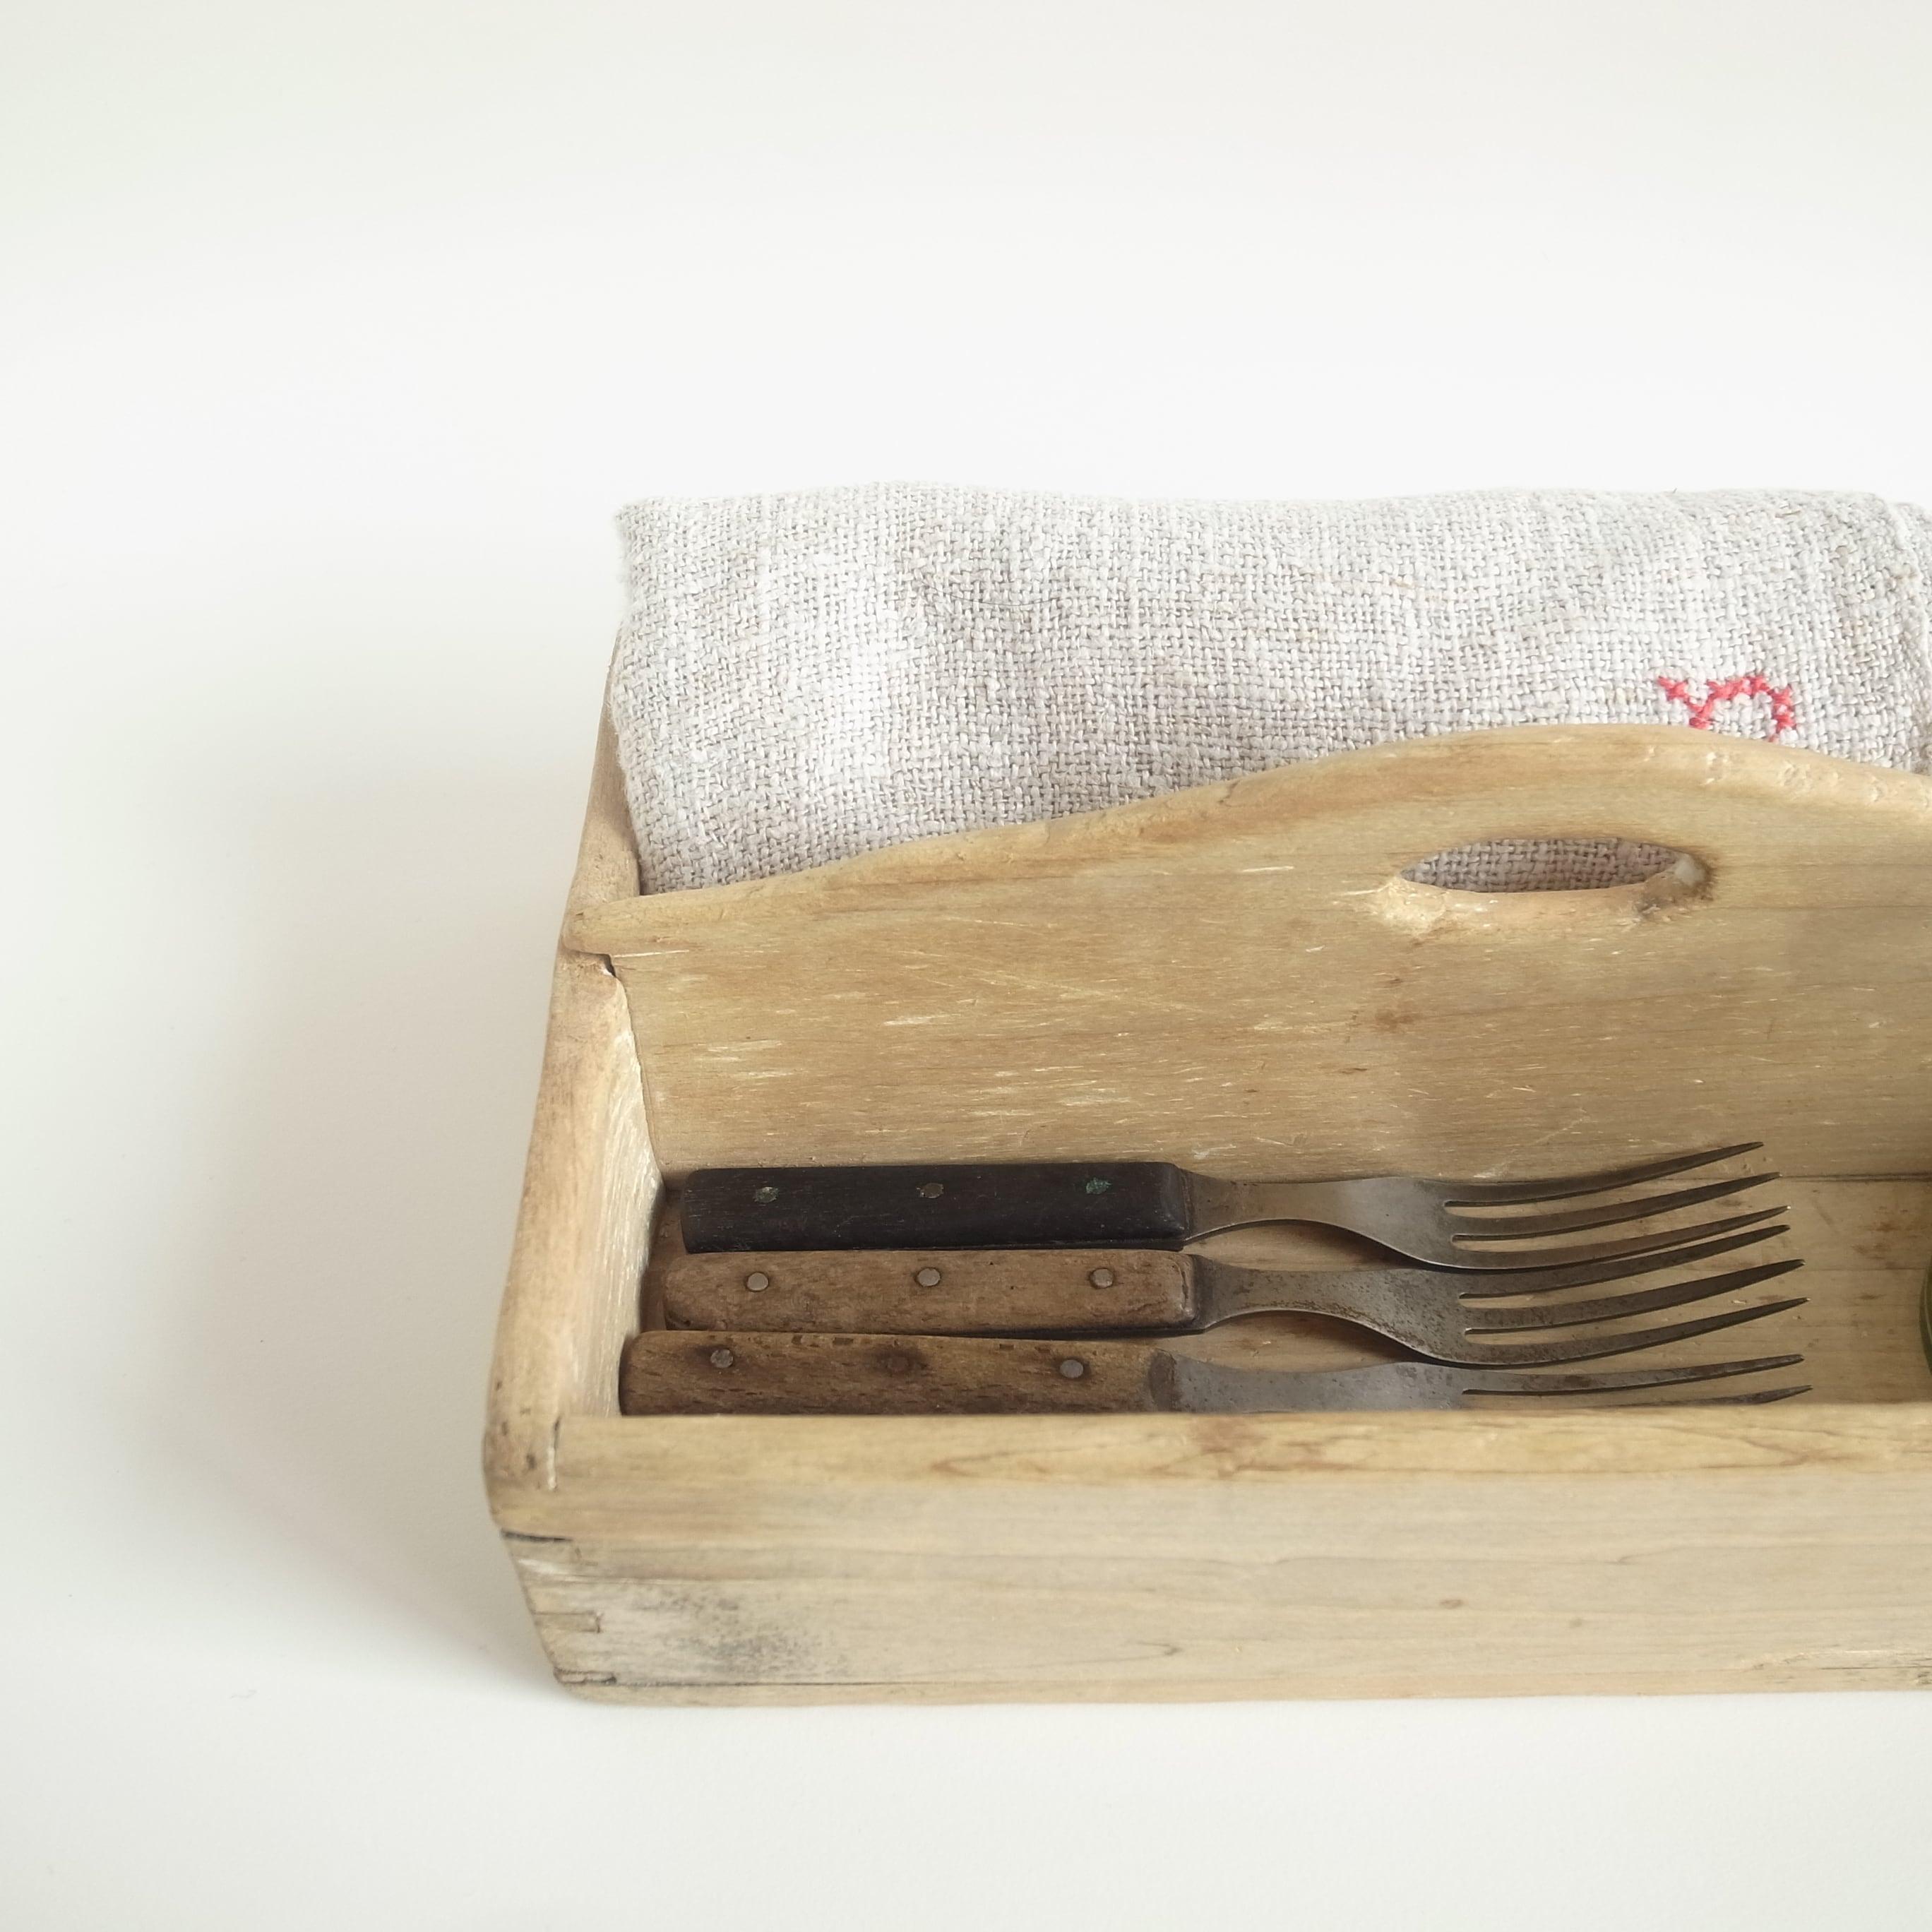 Wooden cutlery case